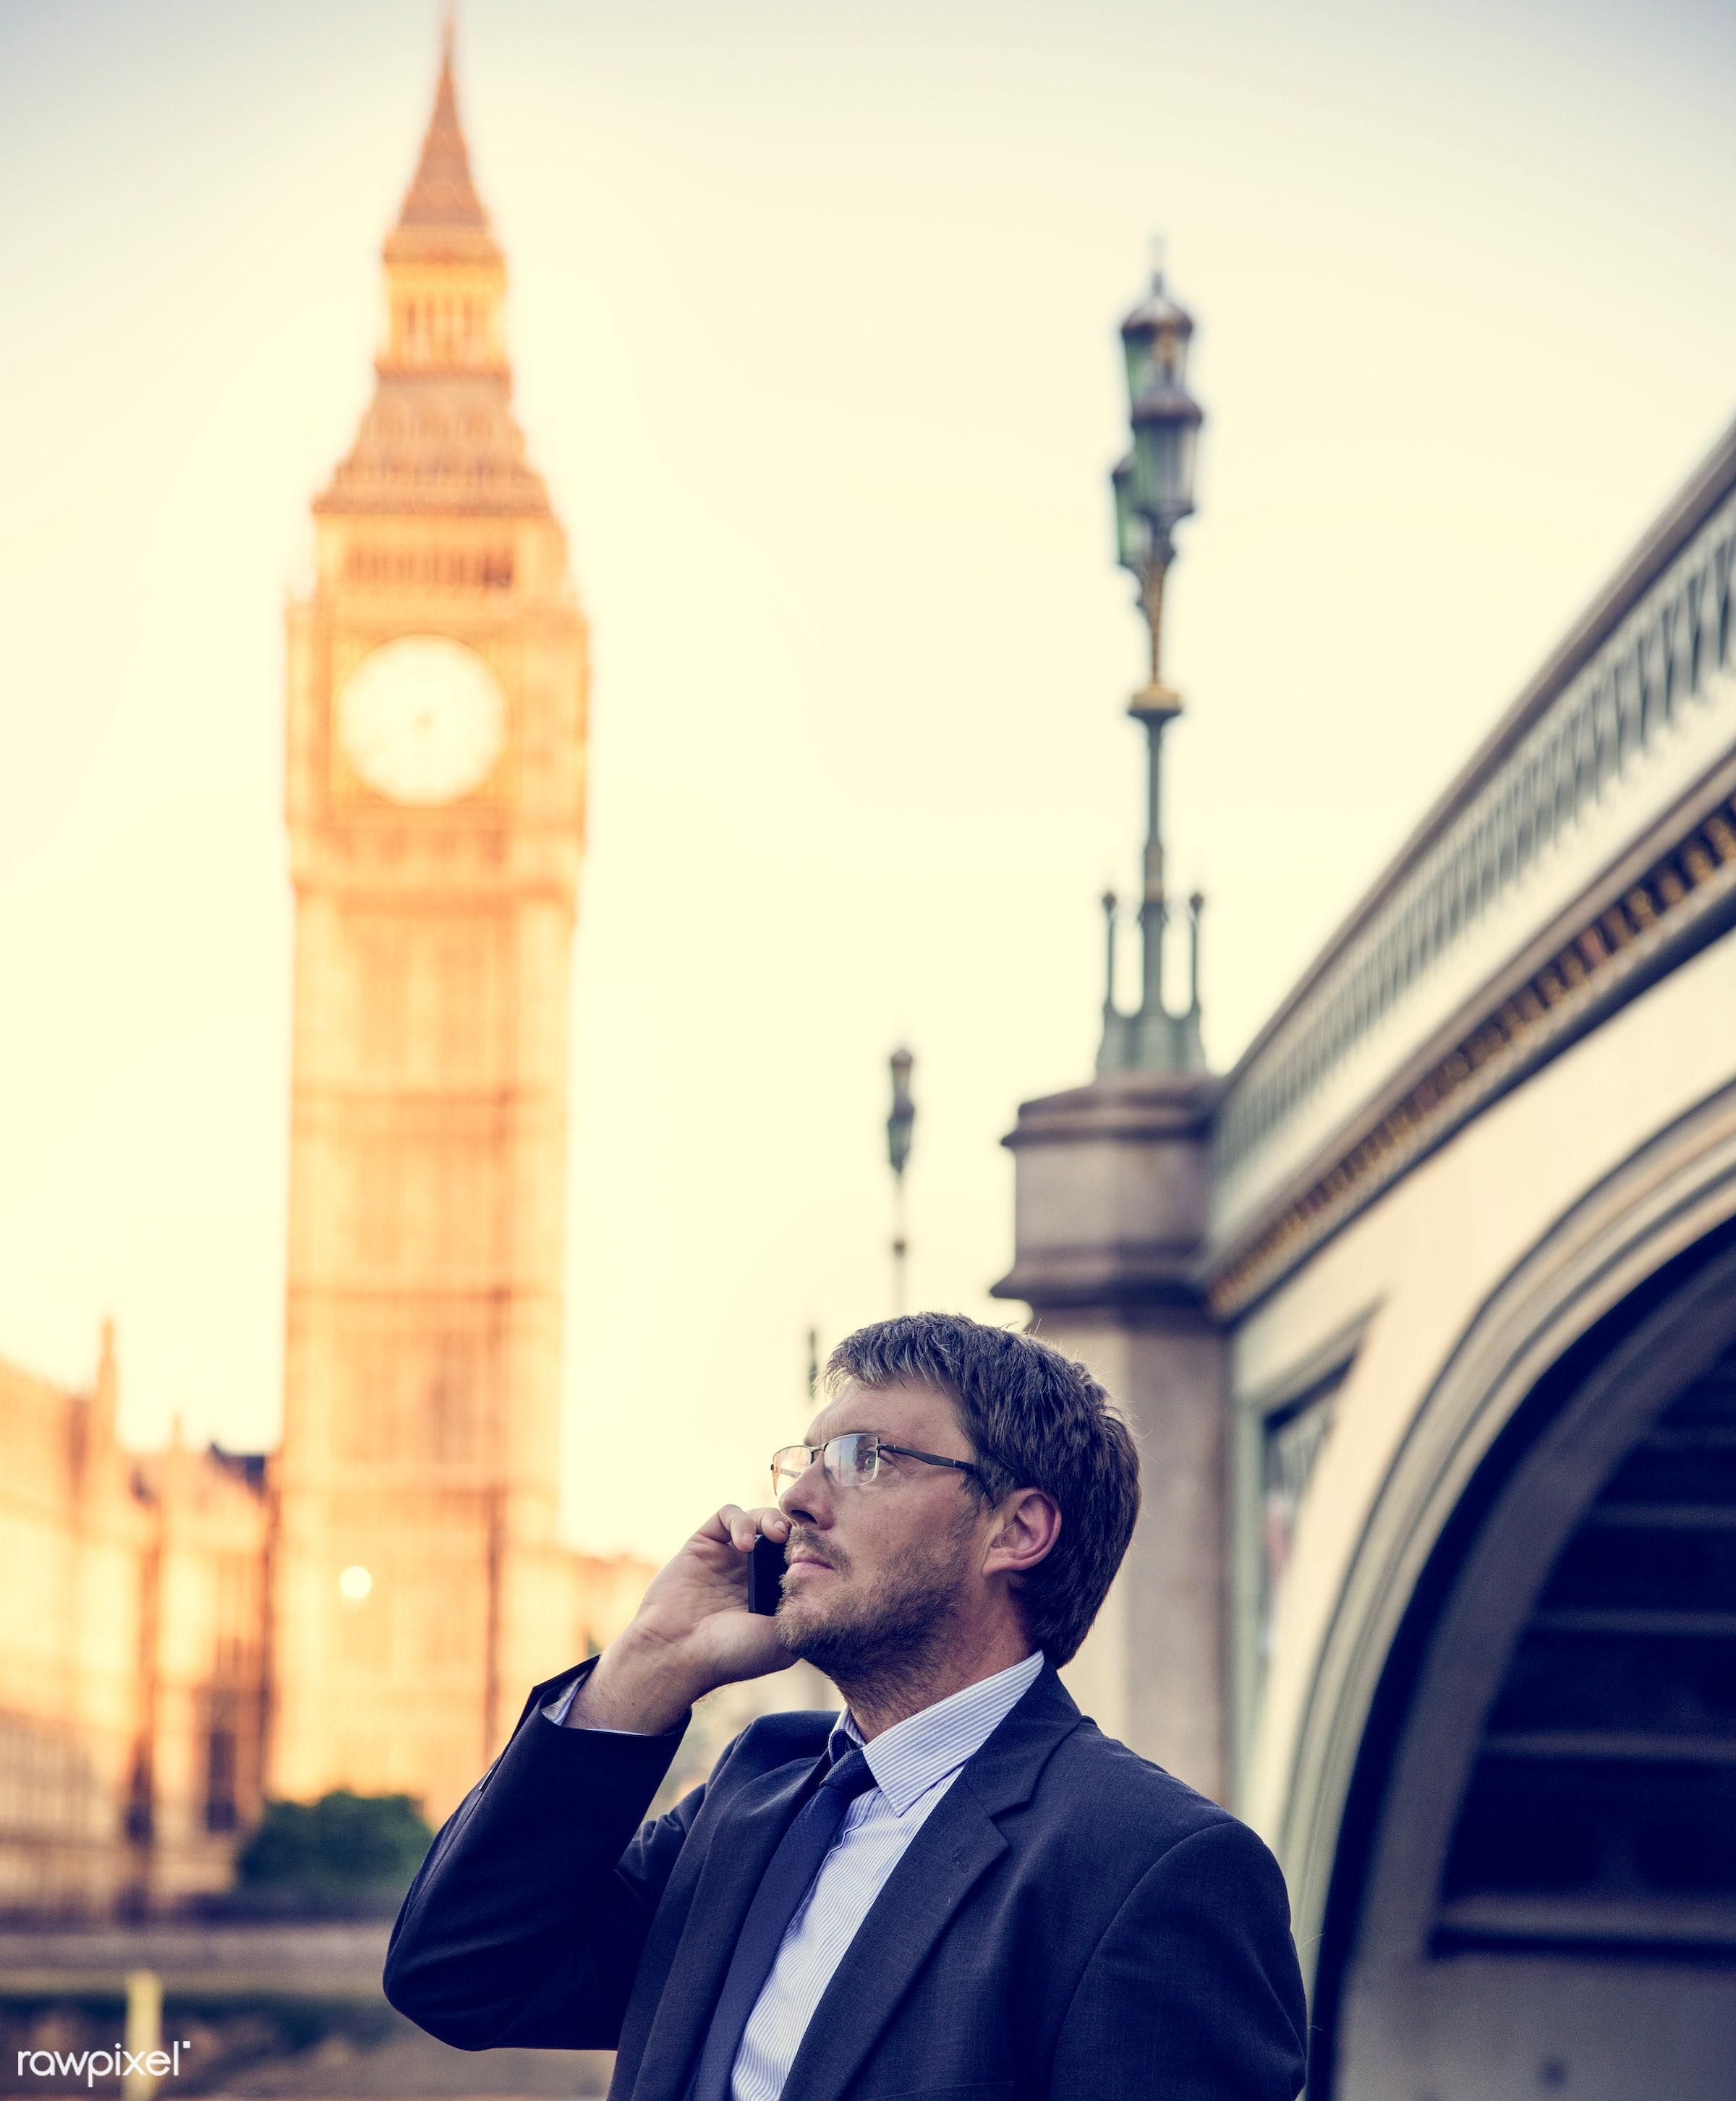 adult, architecture, aspirations, big ben, bridge, britain, building, business, businessman, call, calling, caucasian, city...